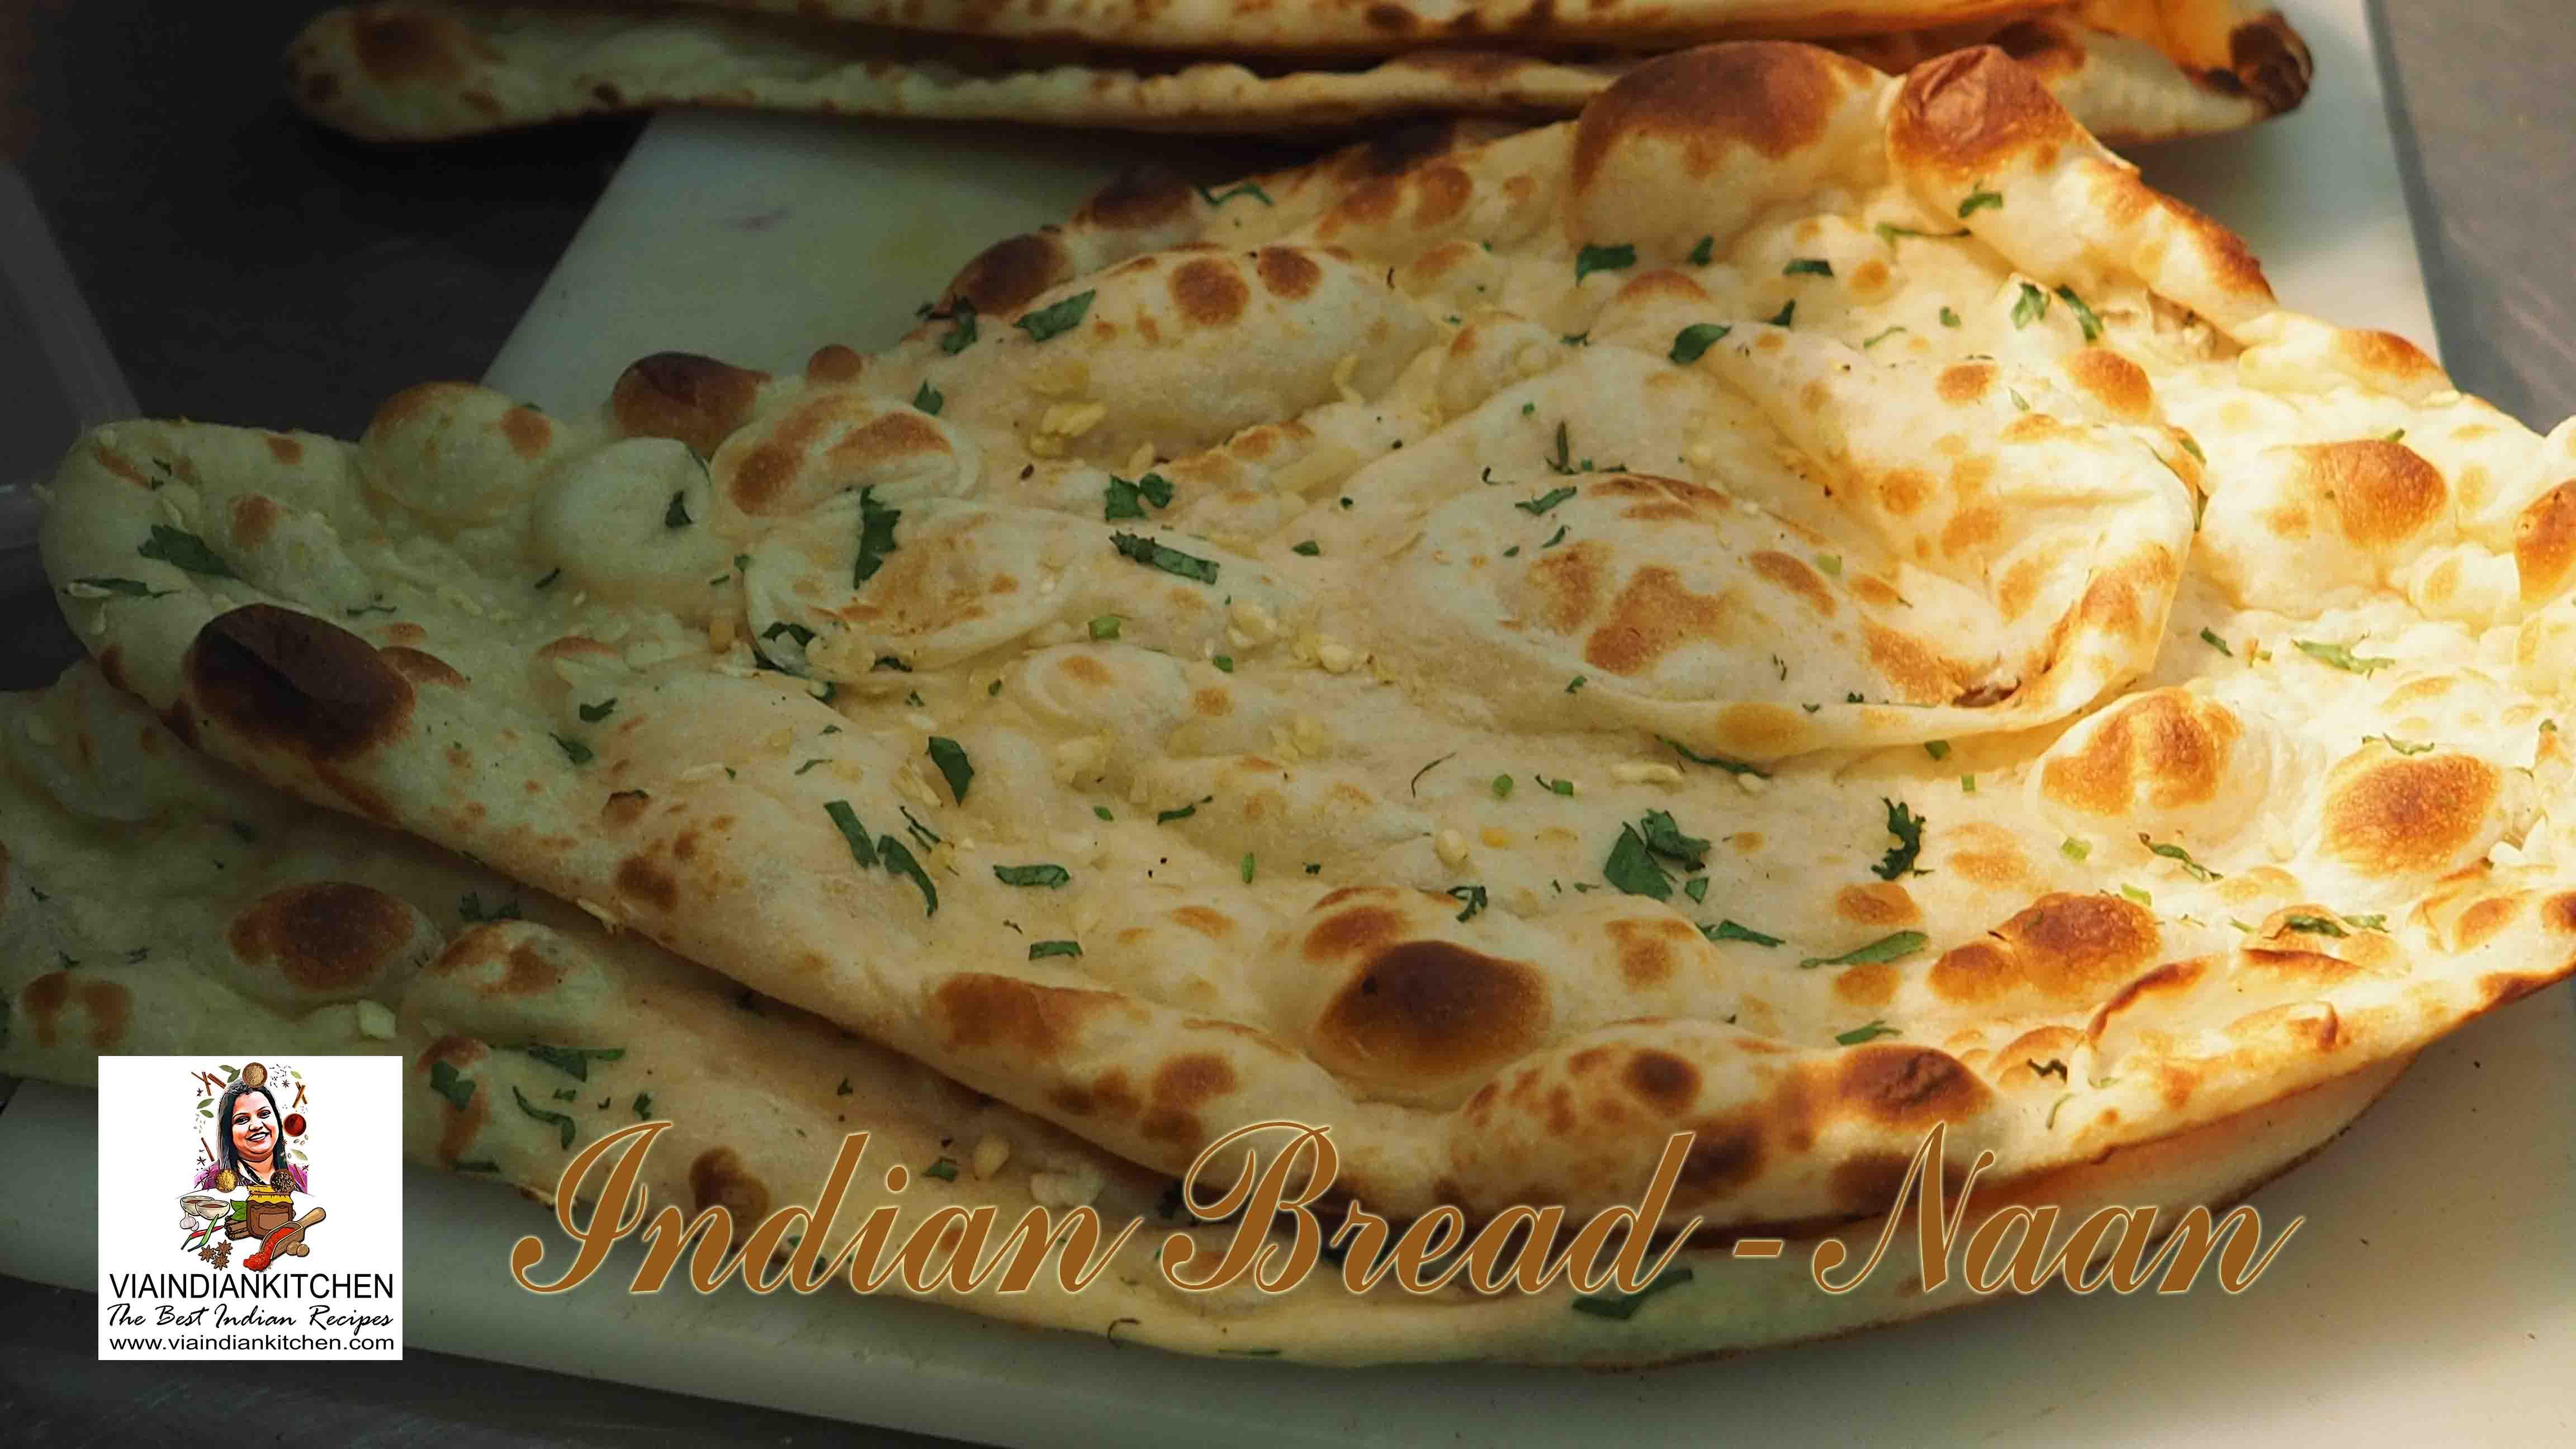 viaindiankitchen - Naan Indian yeast Bread